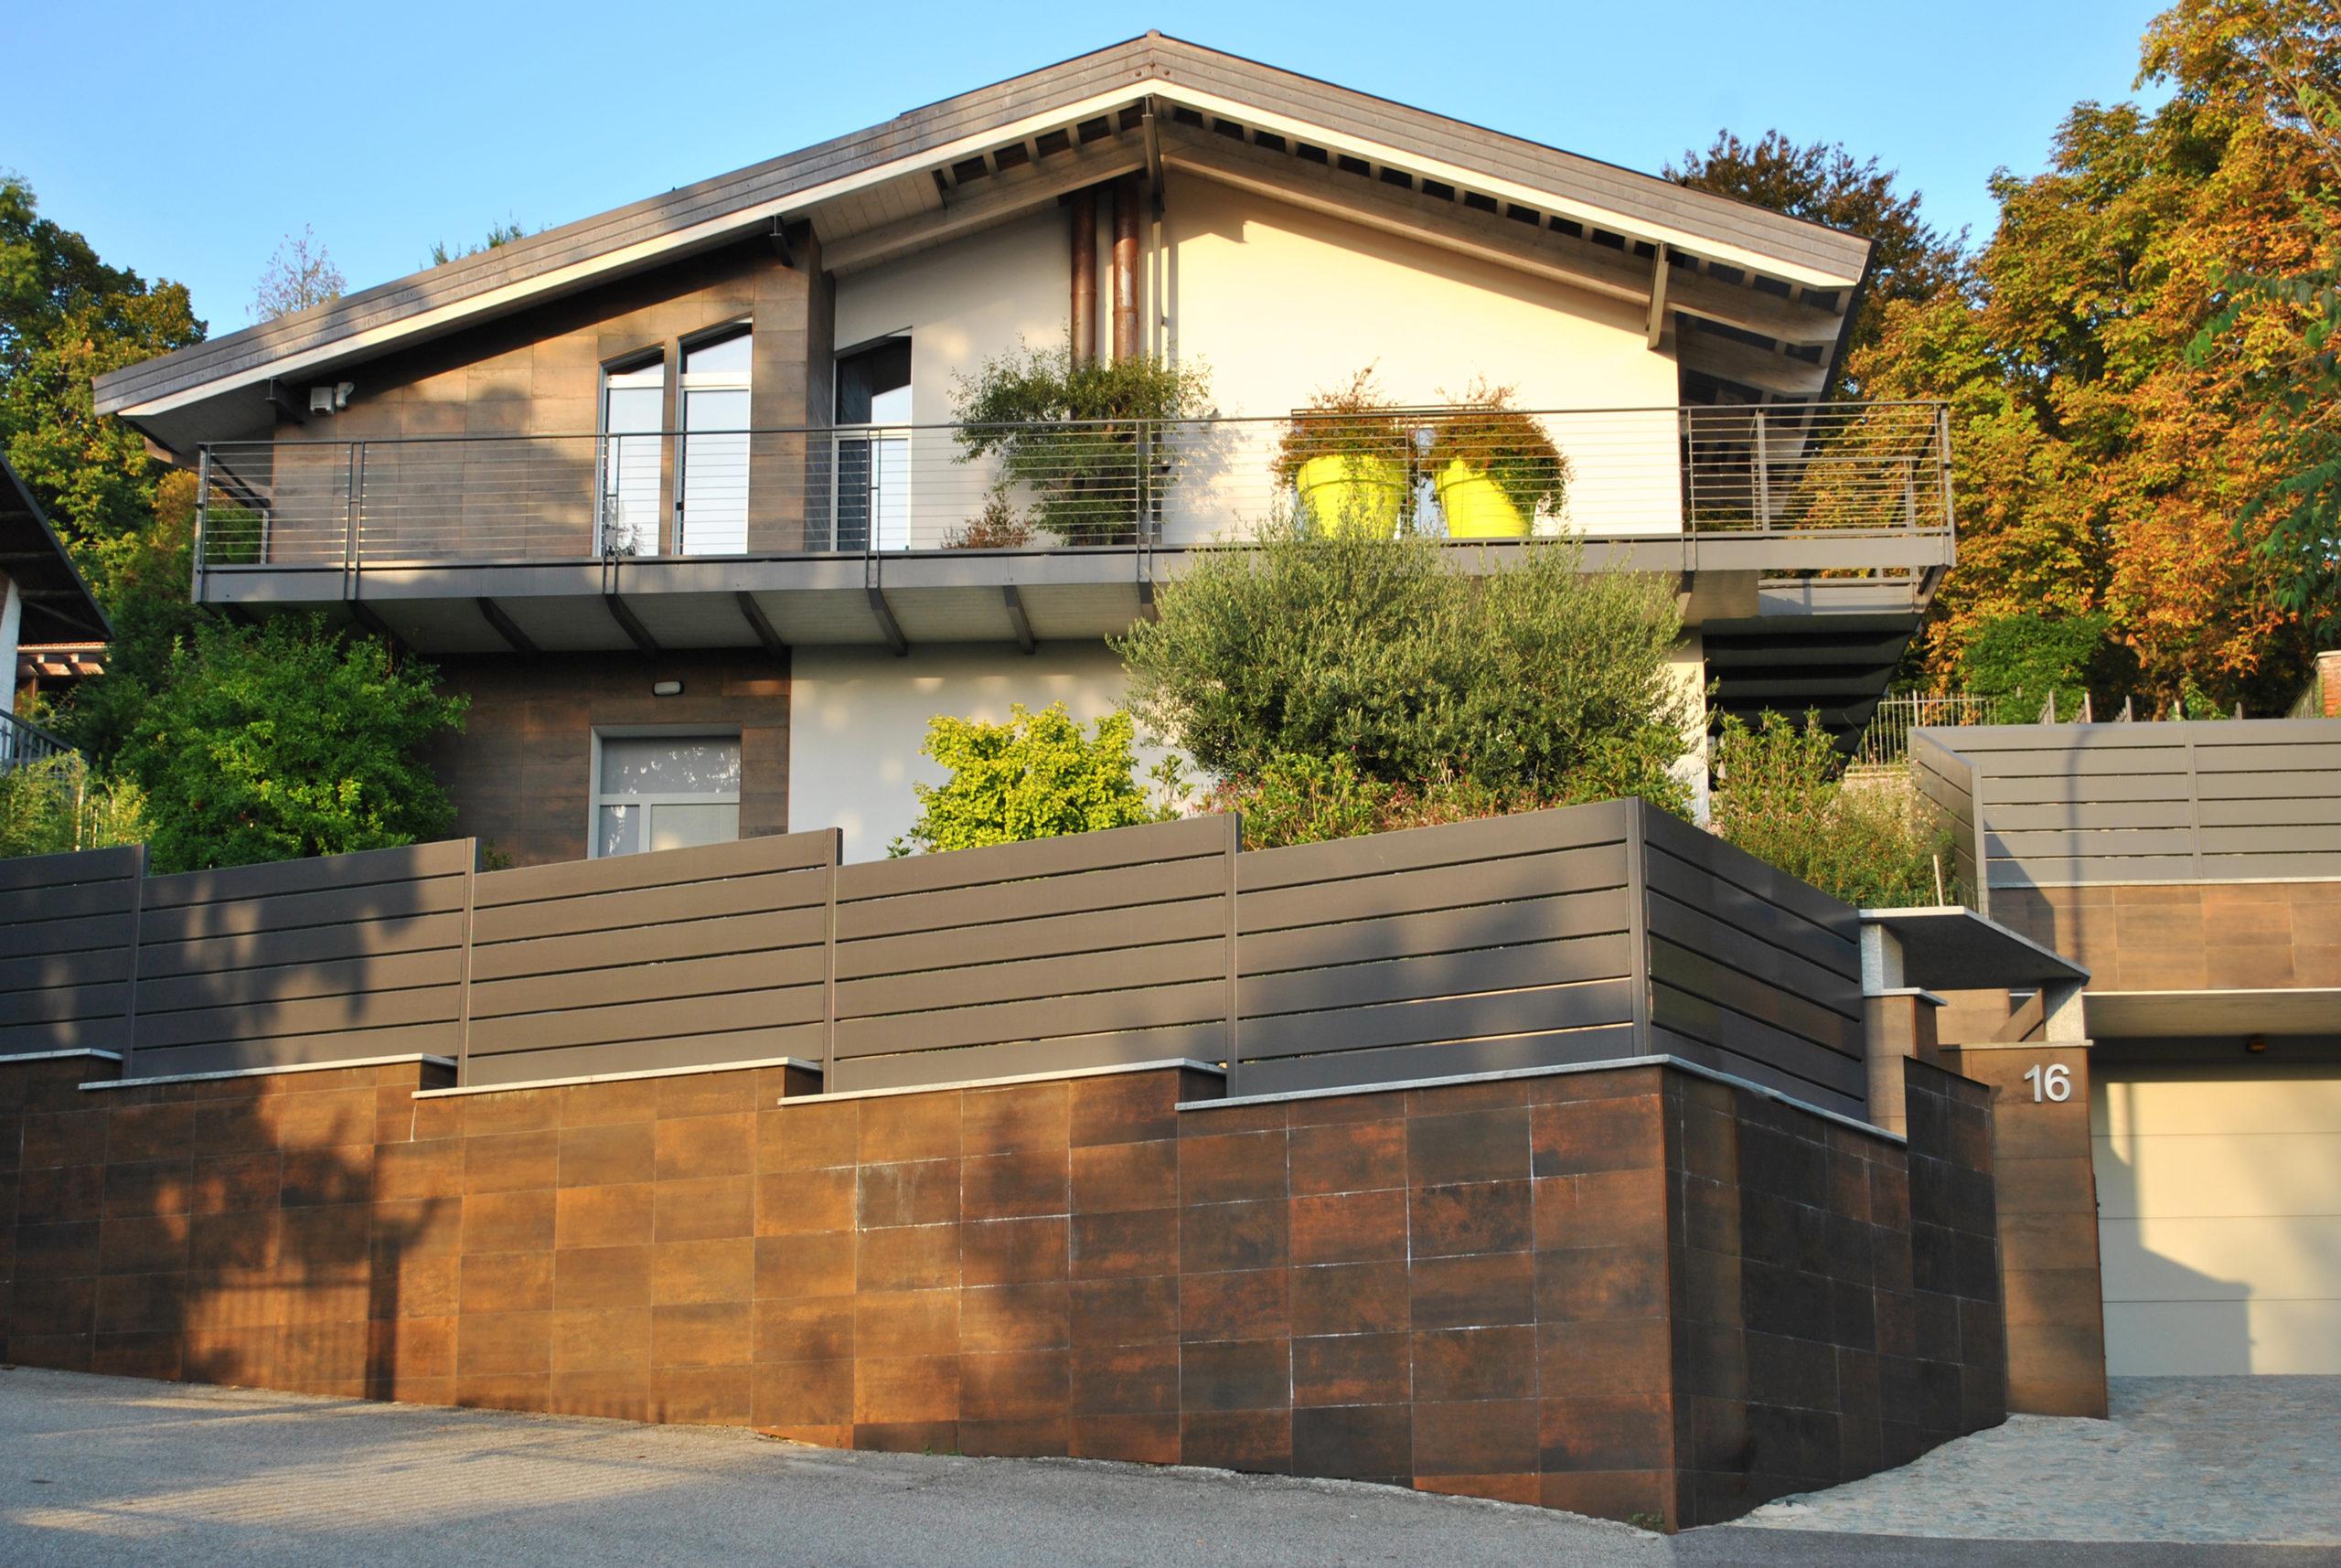 Casa unifamiliare a Moncalieri - Sintagma